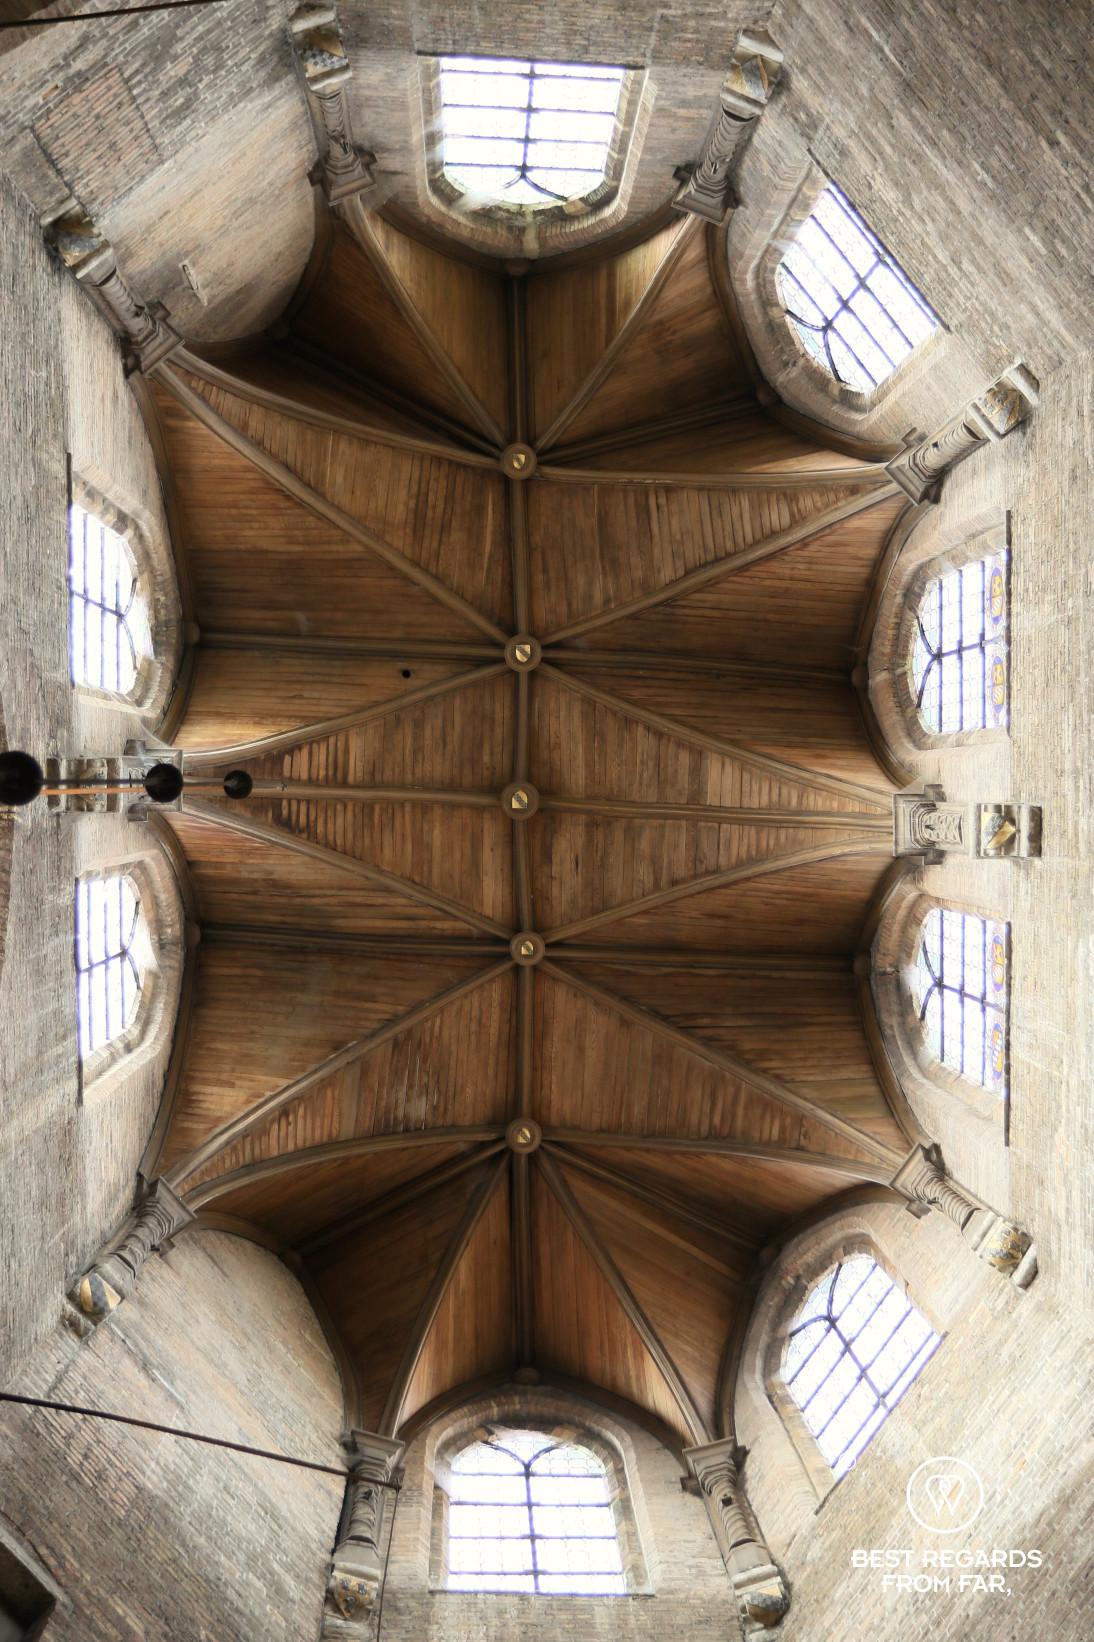 The wooden ceiling of the Jerusalem Chapel, Bruges, Belgium